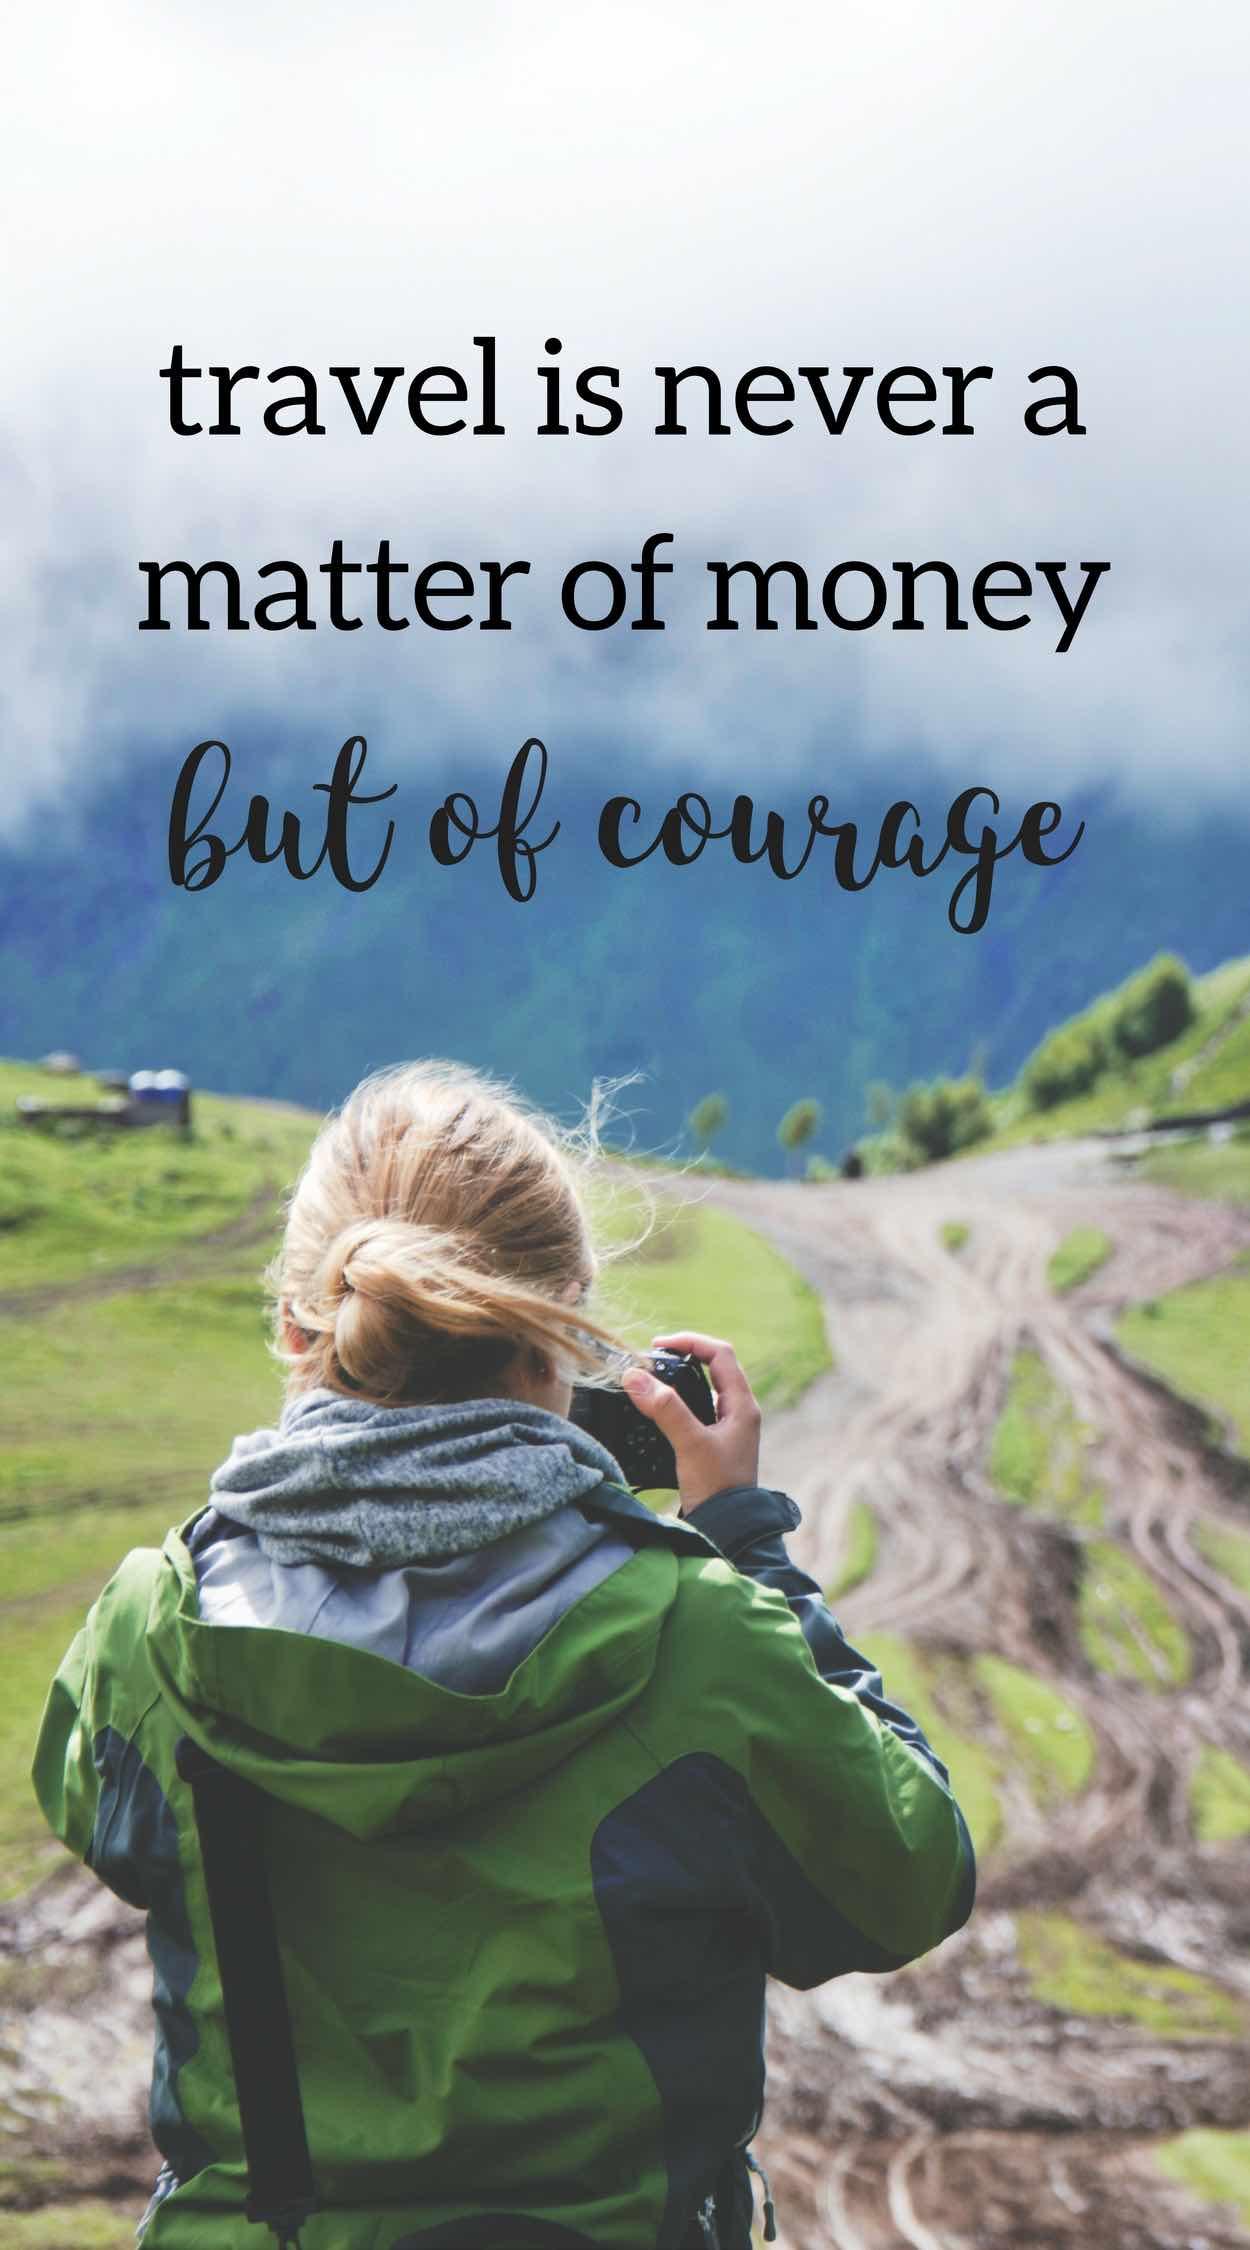 solo travel quotes | solo female traveler quotes